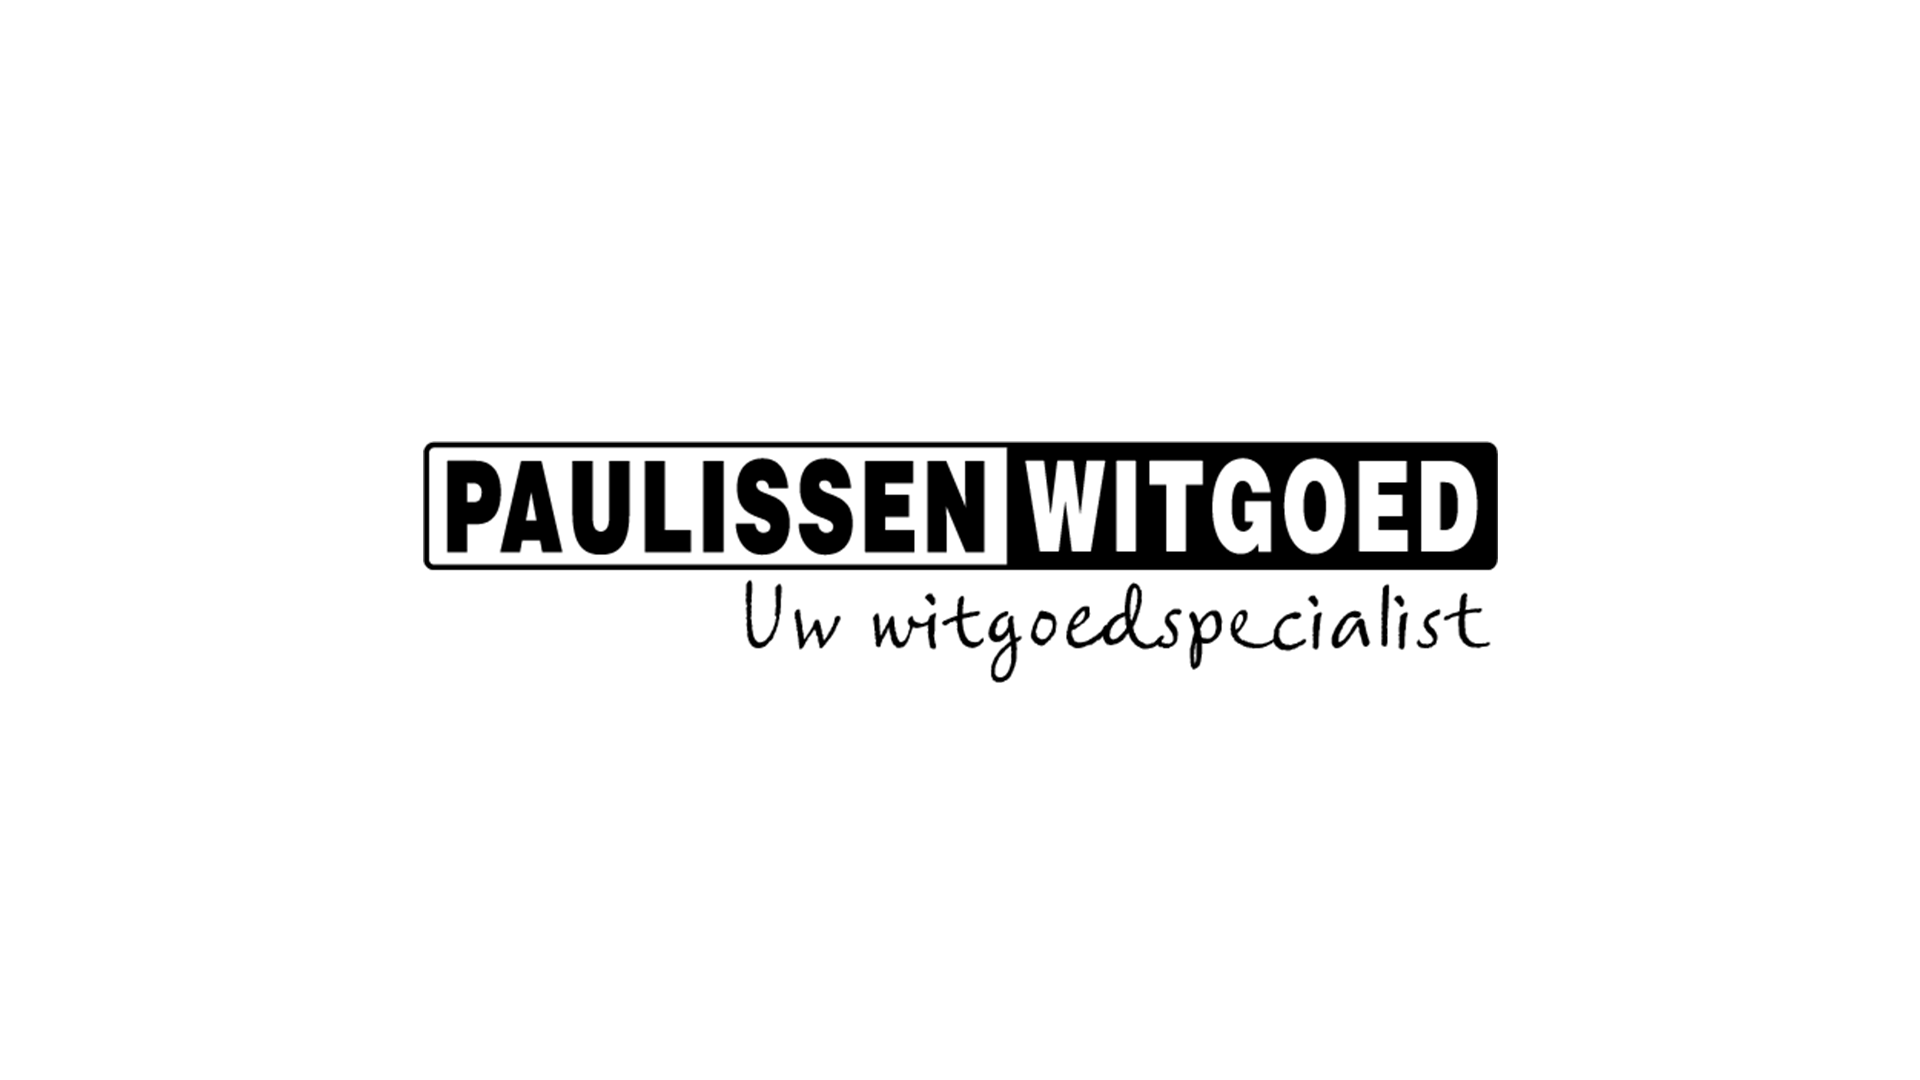 paulissenwitgoed-nl-sitelogo-1